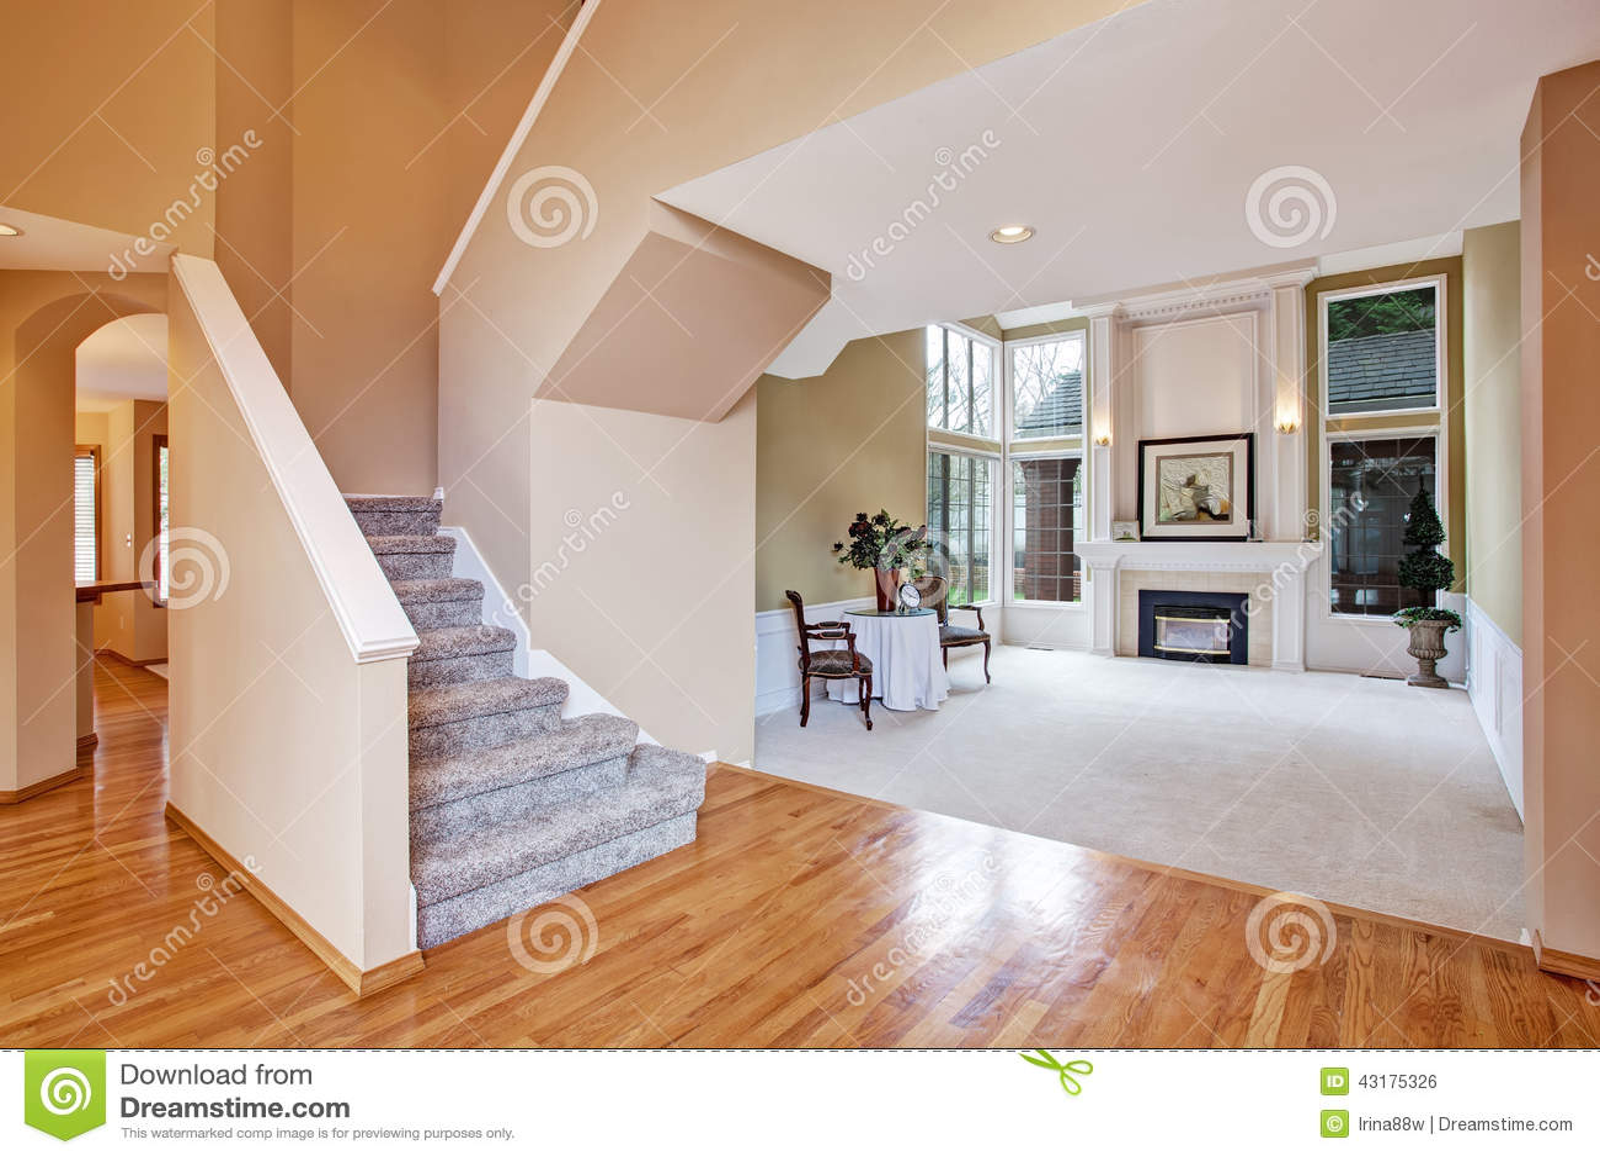 Luxury house interior living room and hallway stock photo for Interieur maison salon